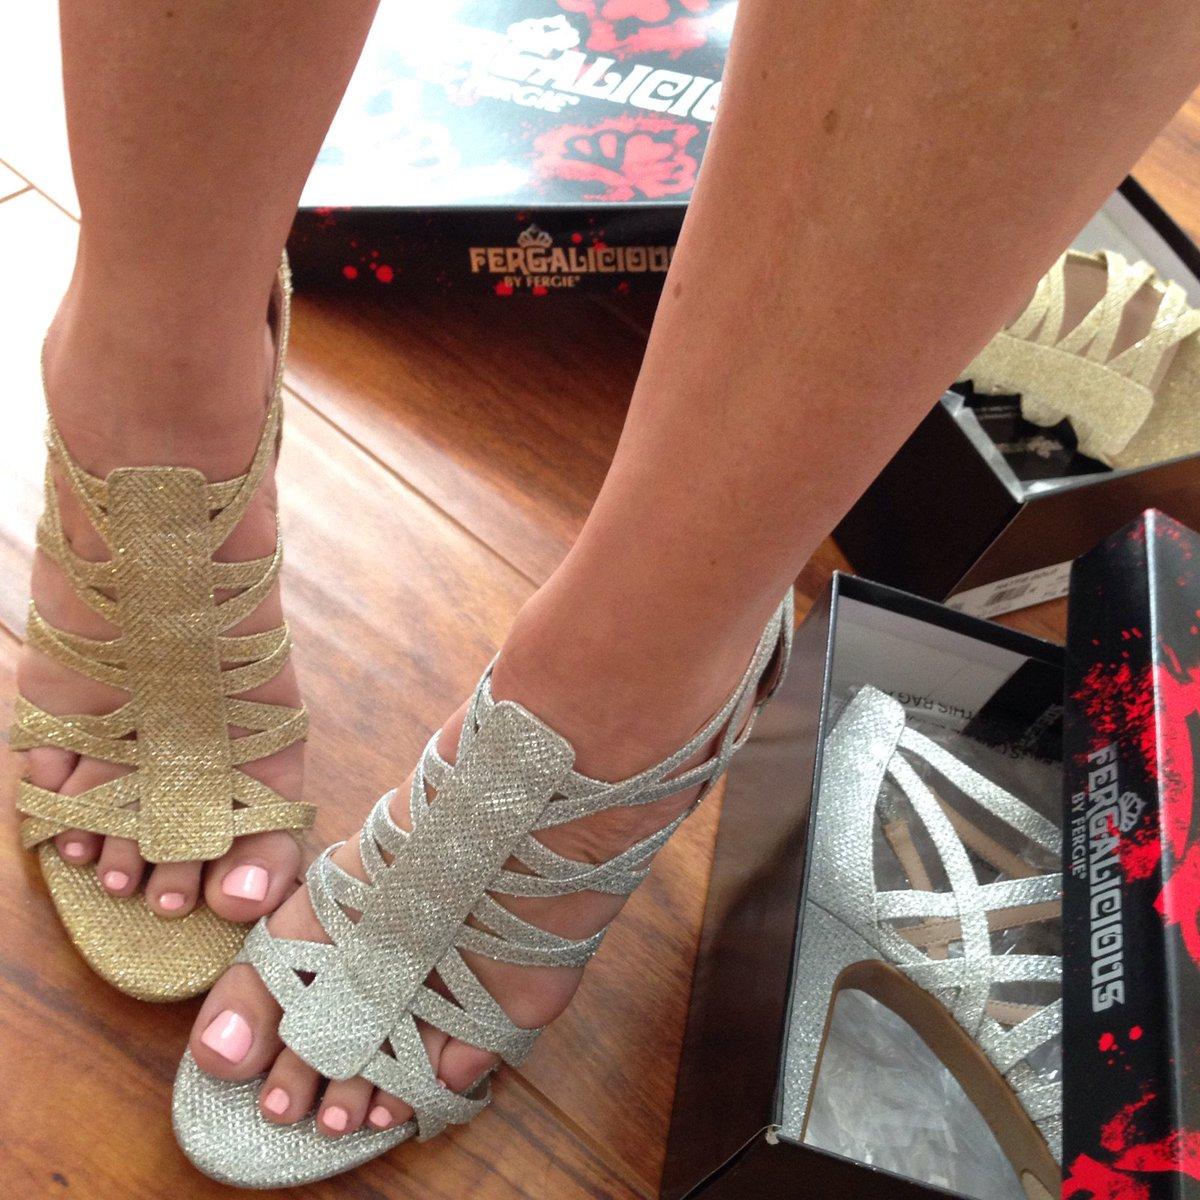 RT @FergaliciousBF: #WhatsAGirlToDo when she has 2 #perfectpairs of #partyshoes?! #fergalicious #shoefie #fergie https://t.co/fsZbCj58Xu ht…